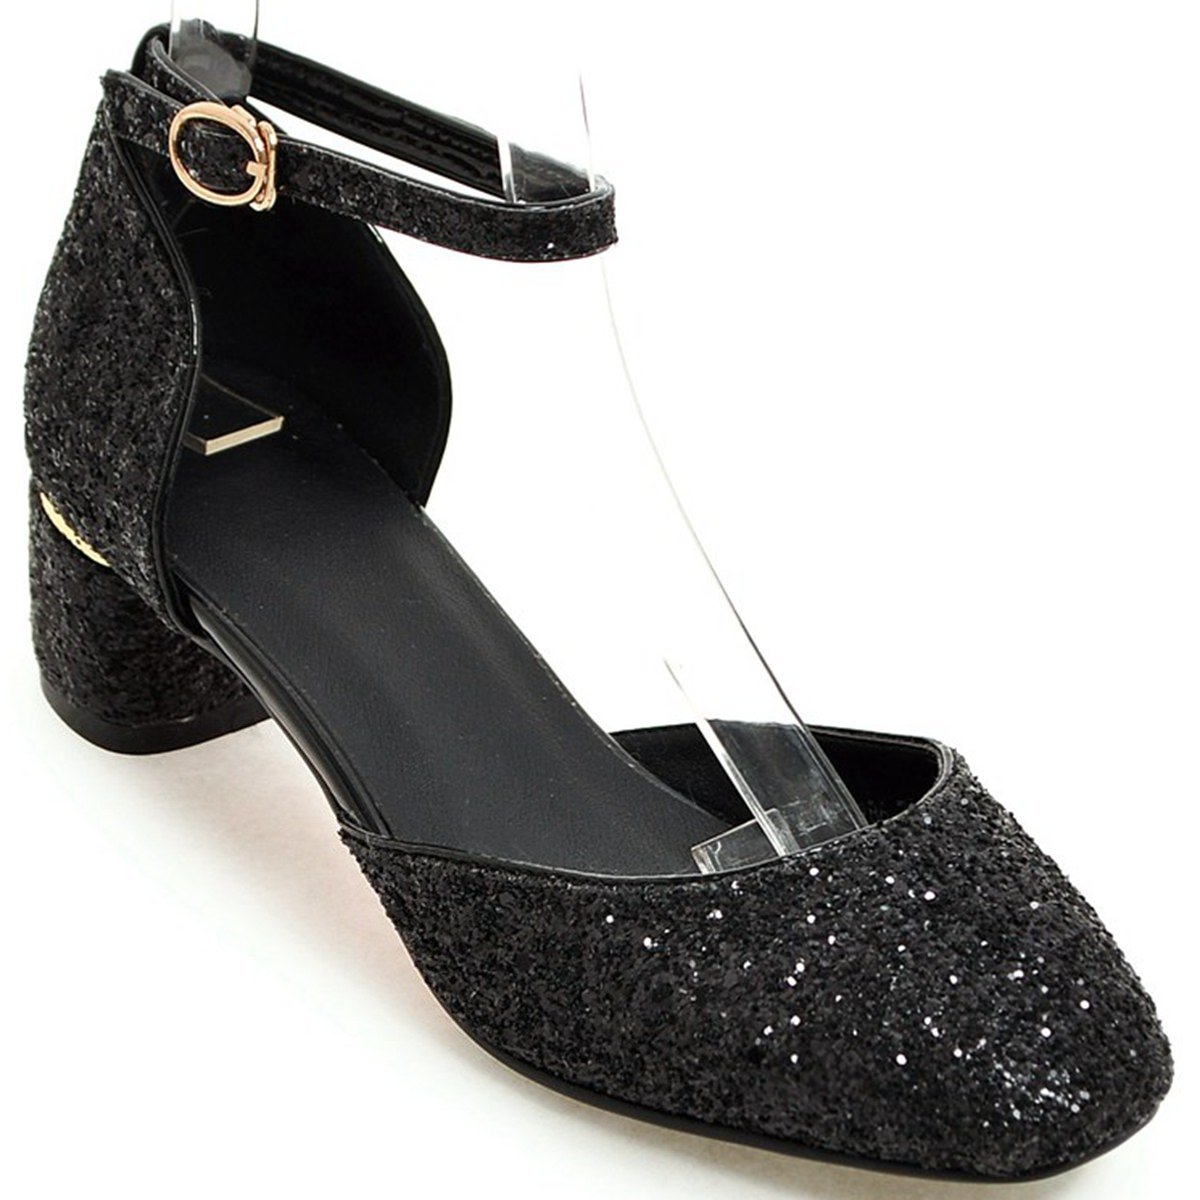 DoraTasia Women's Pointy Toe Glitter Ankle Bling Block Low Heel Ankle Glitter Strap Pumps Party Wedding Dress Shoes 7 M US|Black B079KYMT7H c8b72b